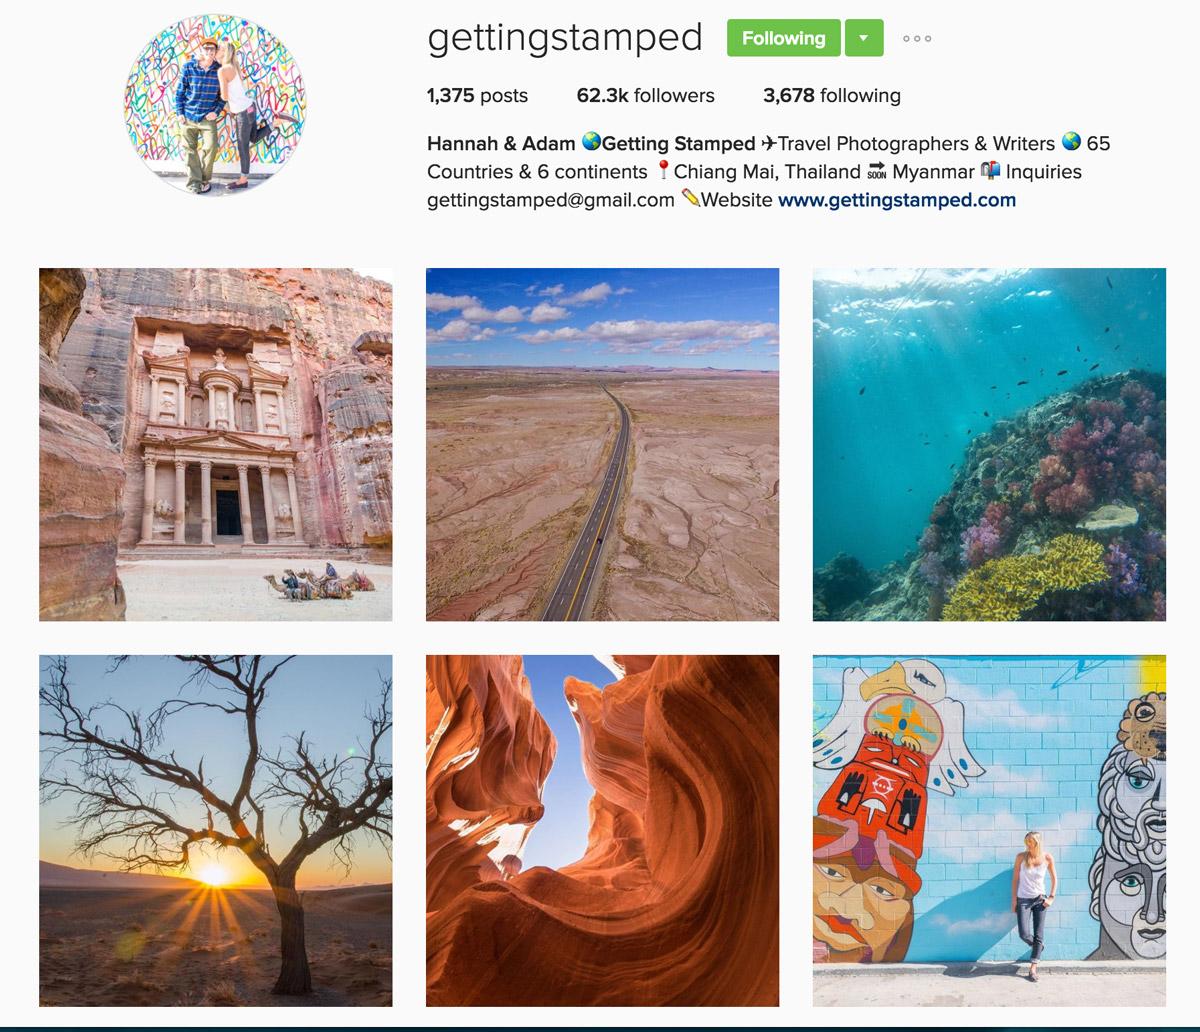 Travel-Instagram-Getting-Stamped